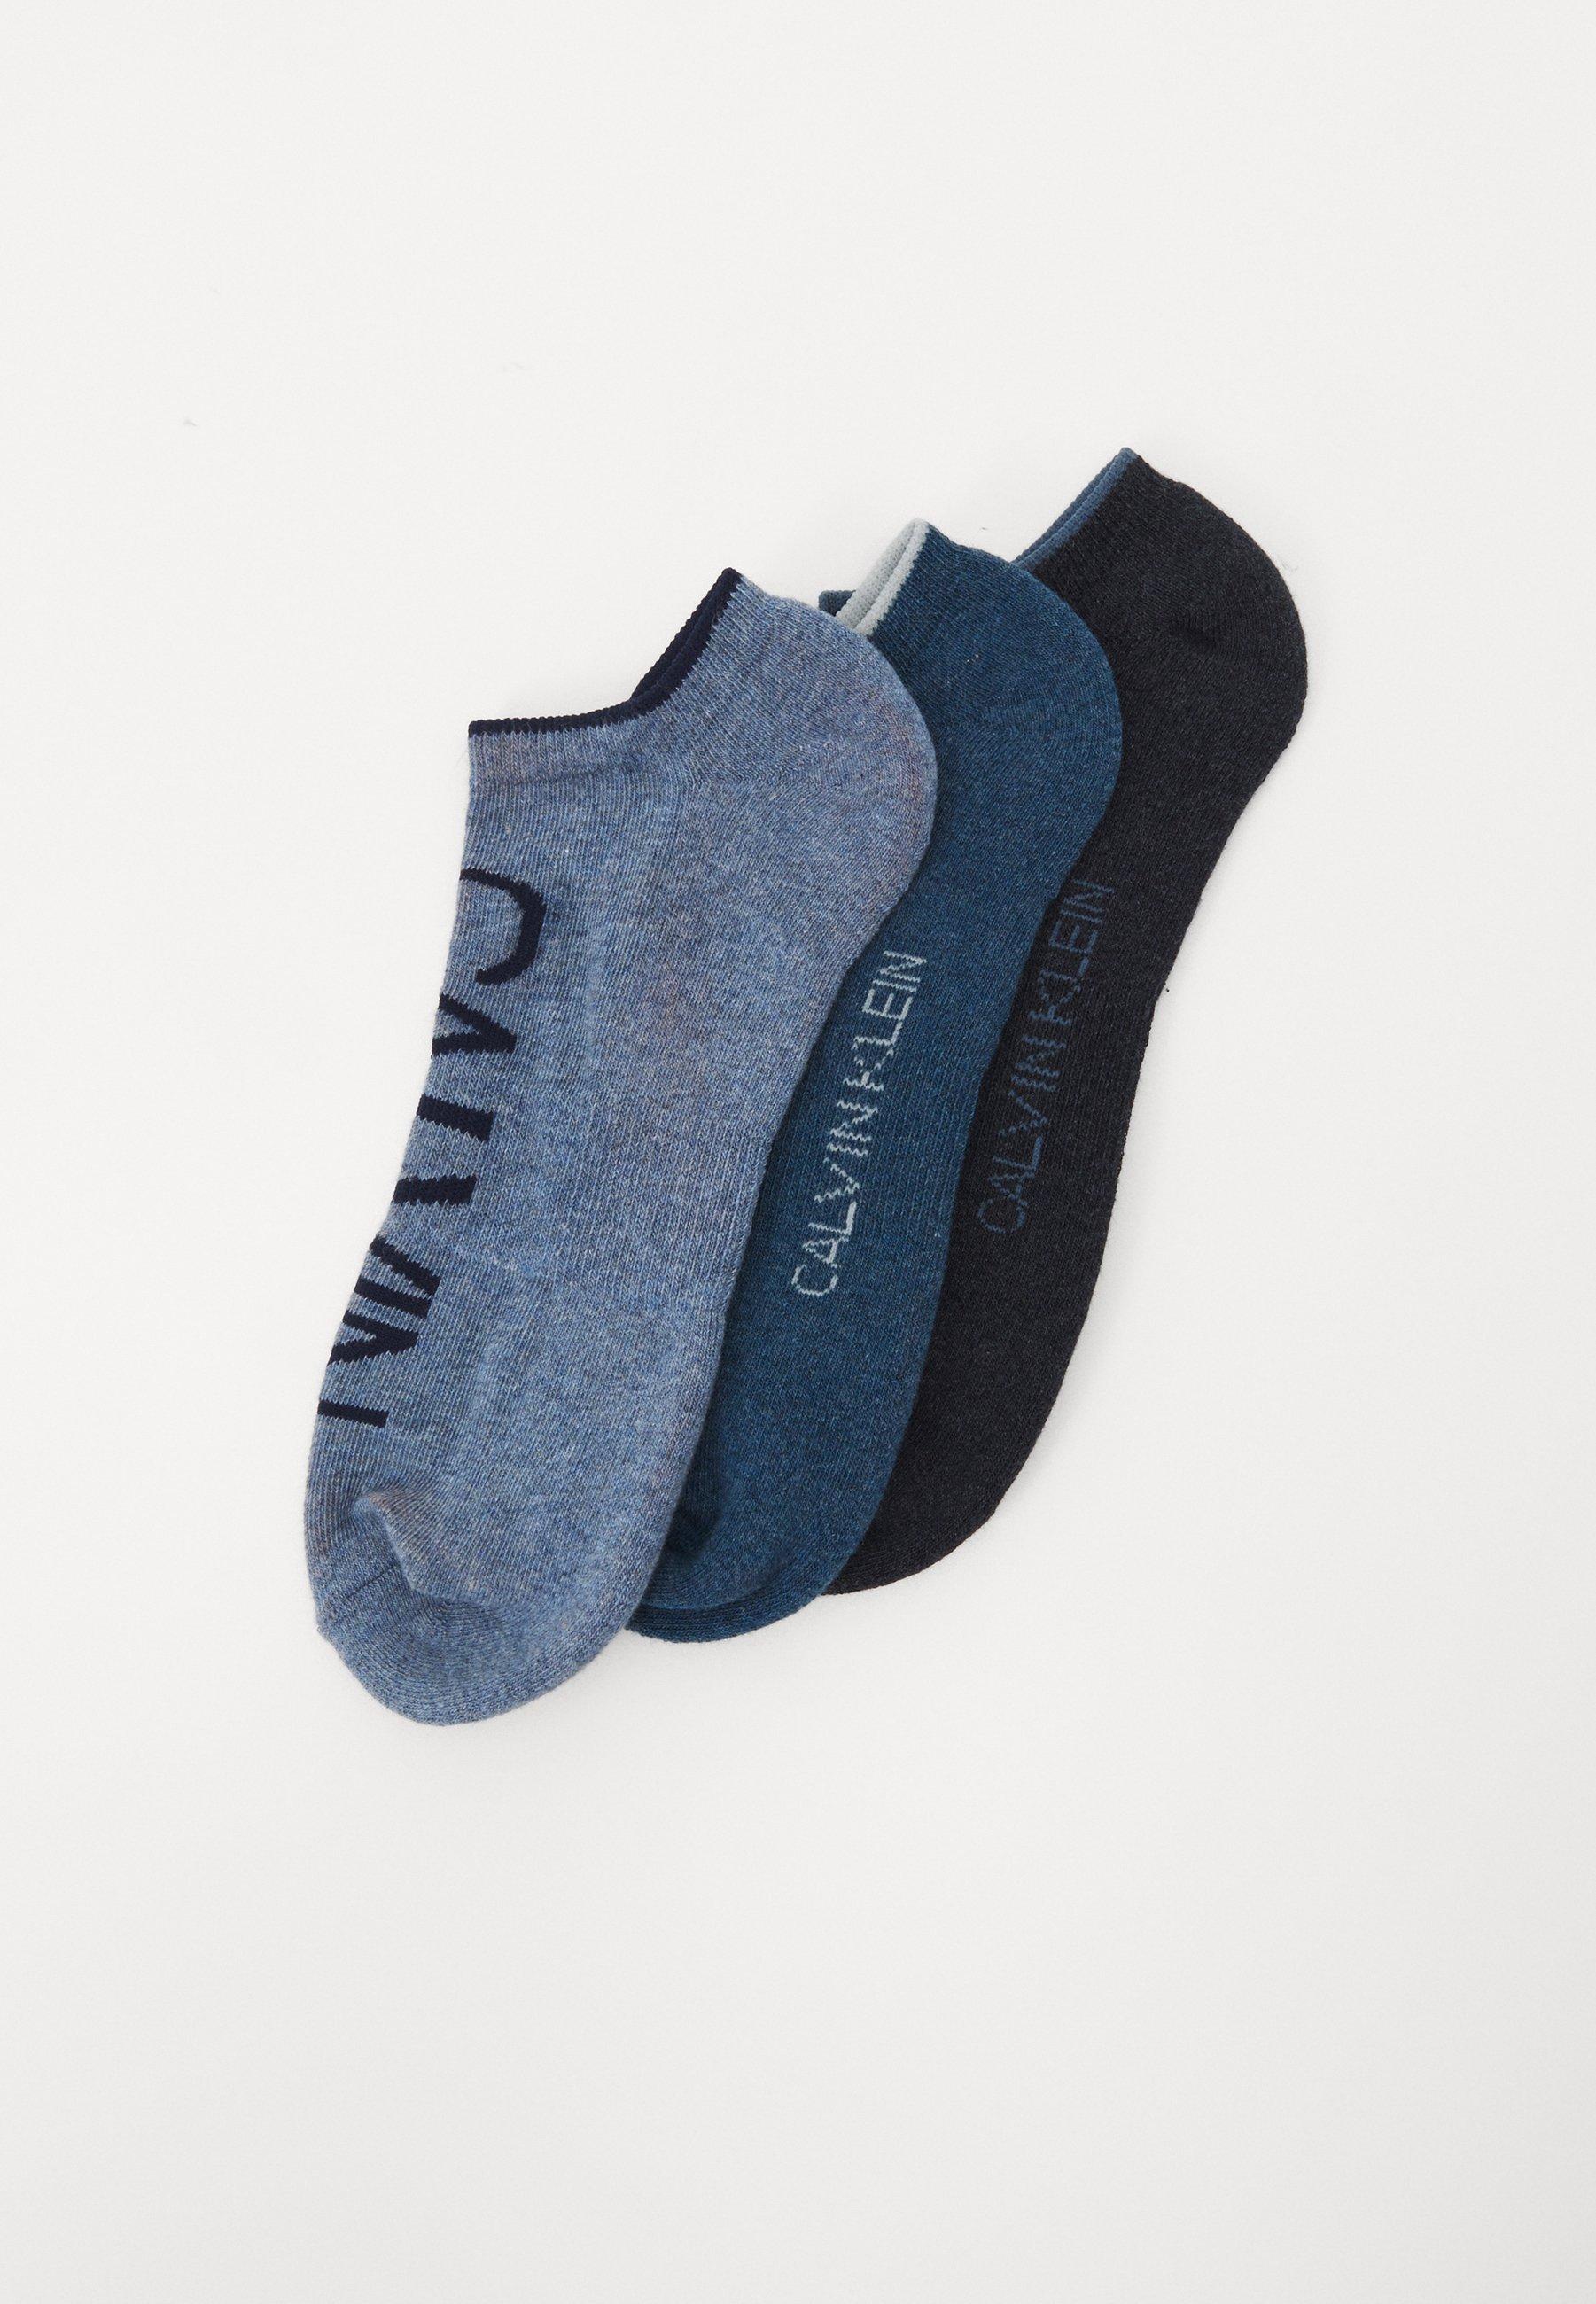 Men MENS NO SHOW ATHLEISURE GRANT 3 PACK - Socks